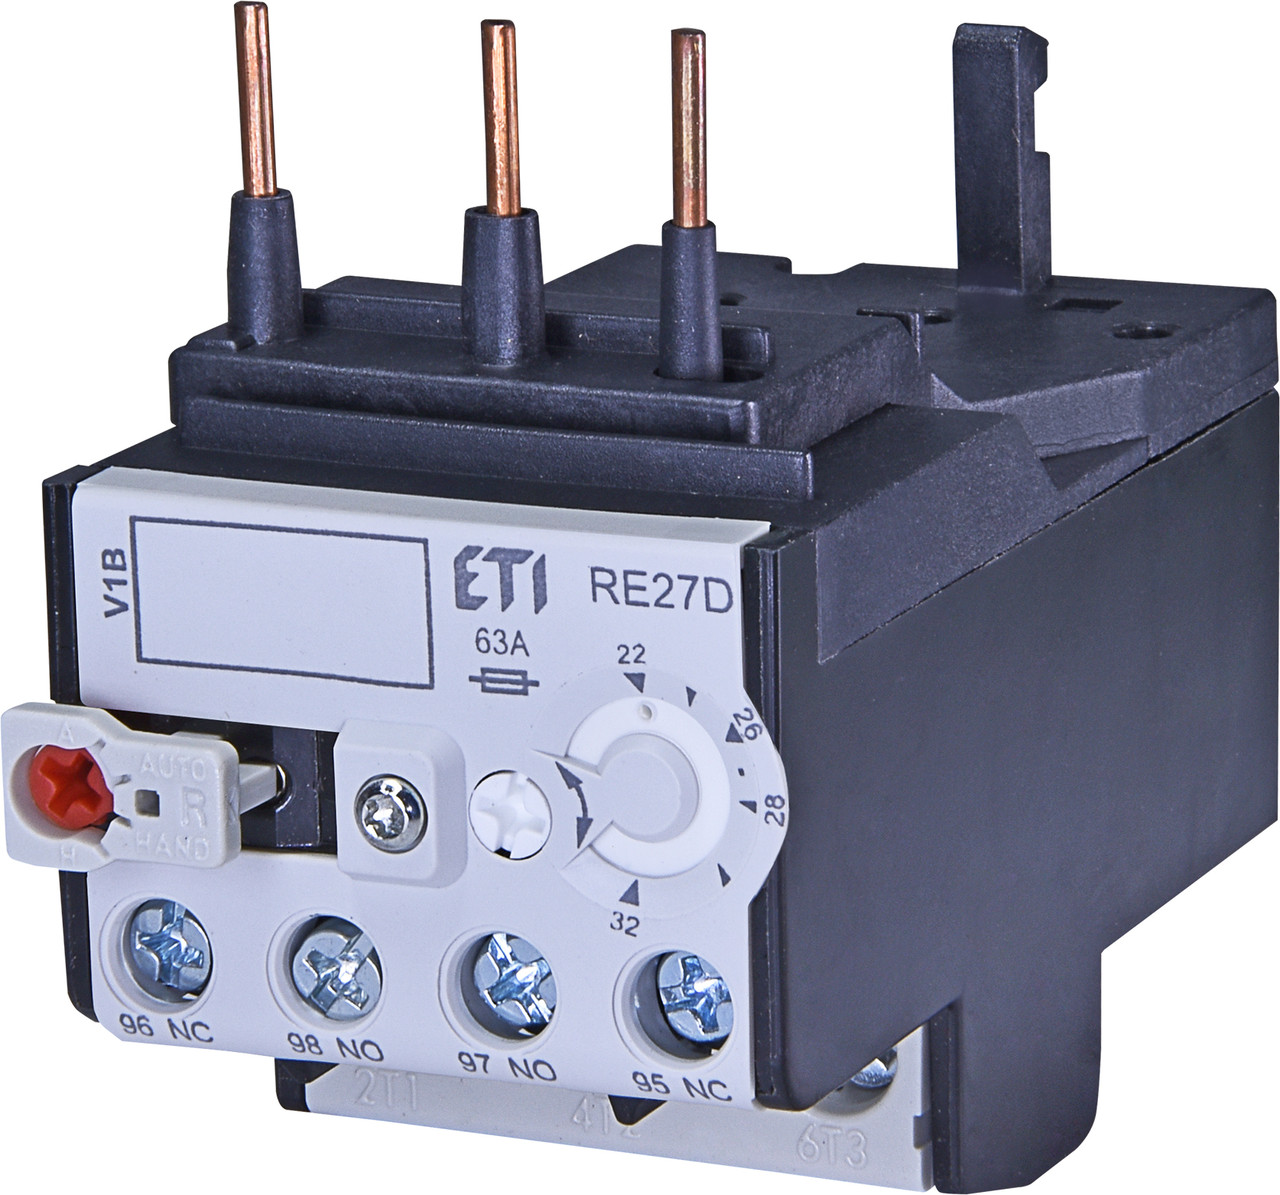 Тепловое реле ETI RE 27D-32 (15-23A) CEM9-CEM25 46424014 (для контакторов CEM9, CEM12, CEM18, CEM25)